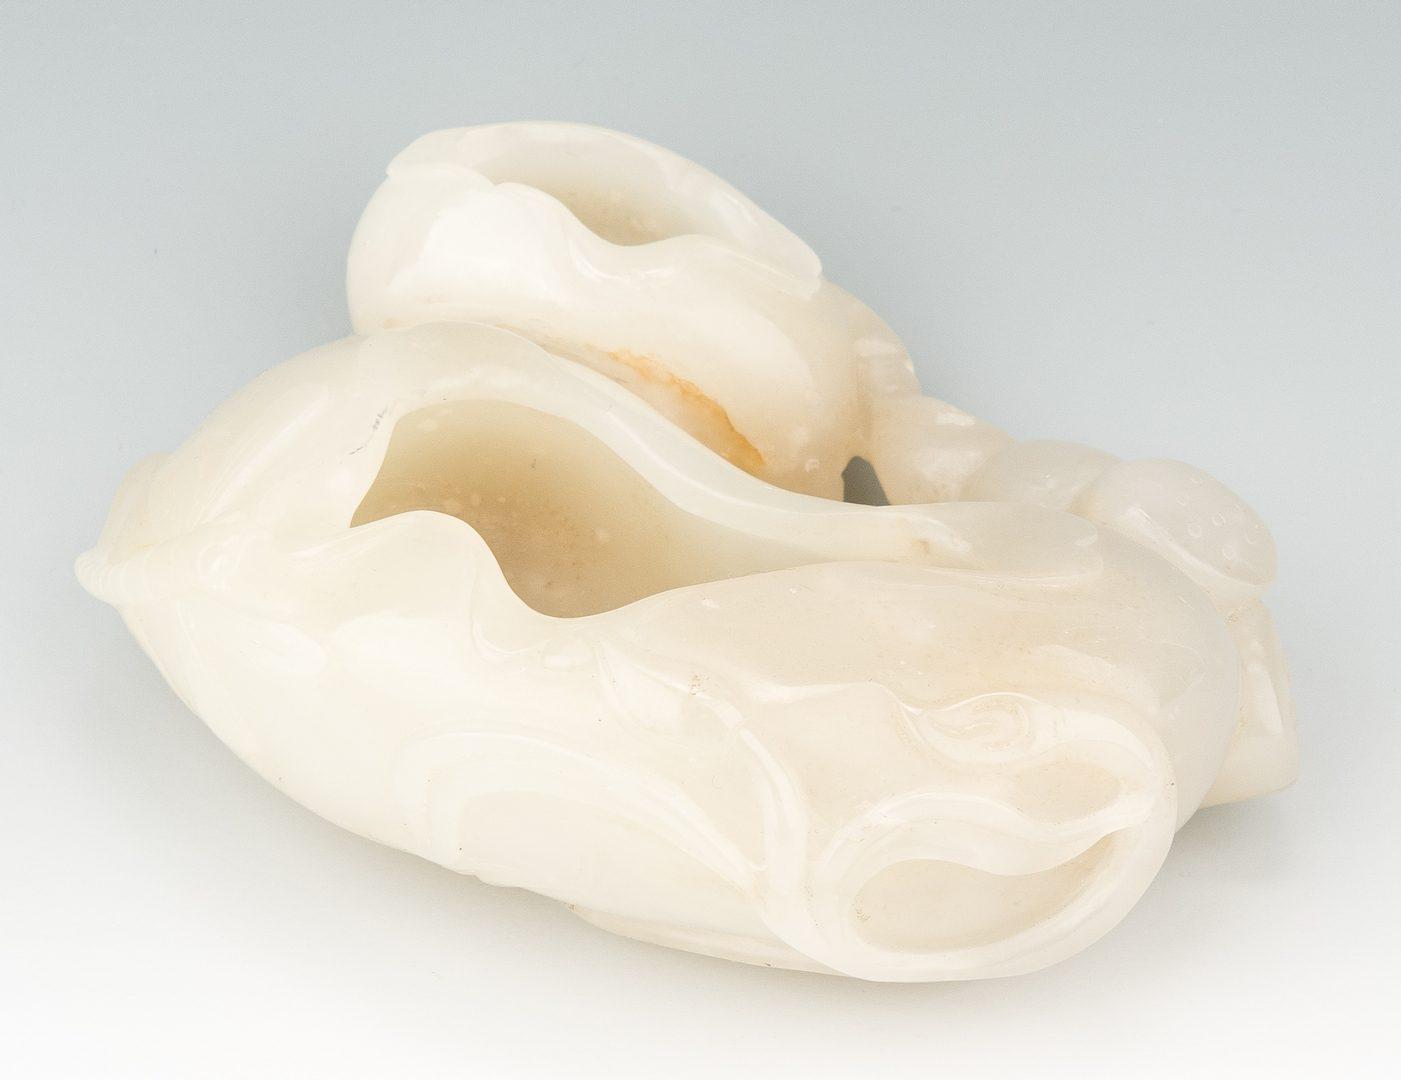 Lot 5: Chinese White Jade Double Brush Washer